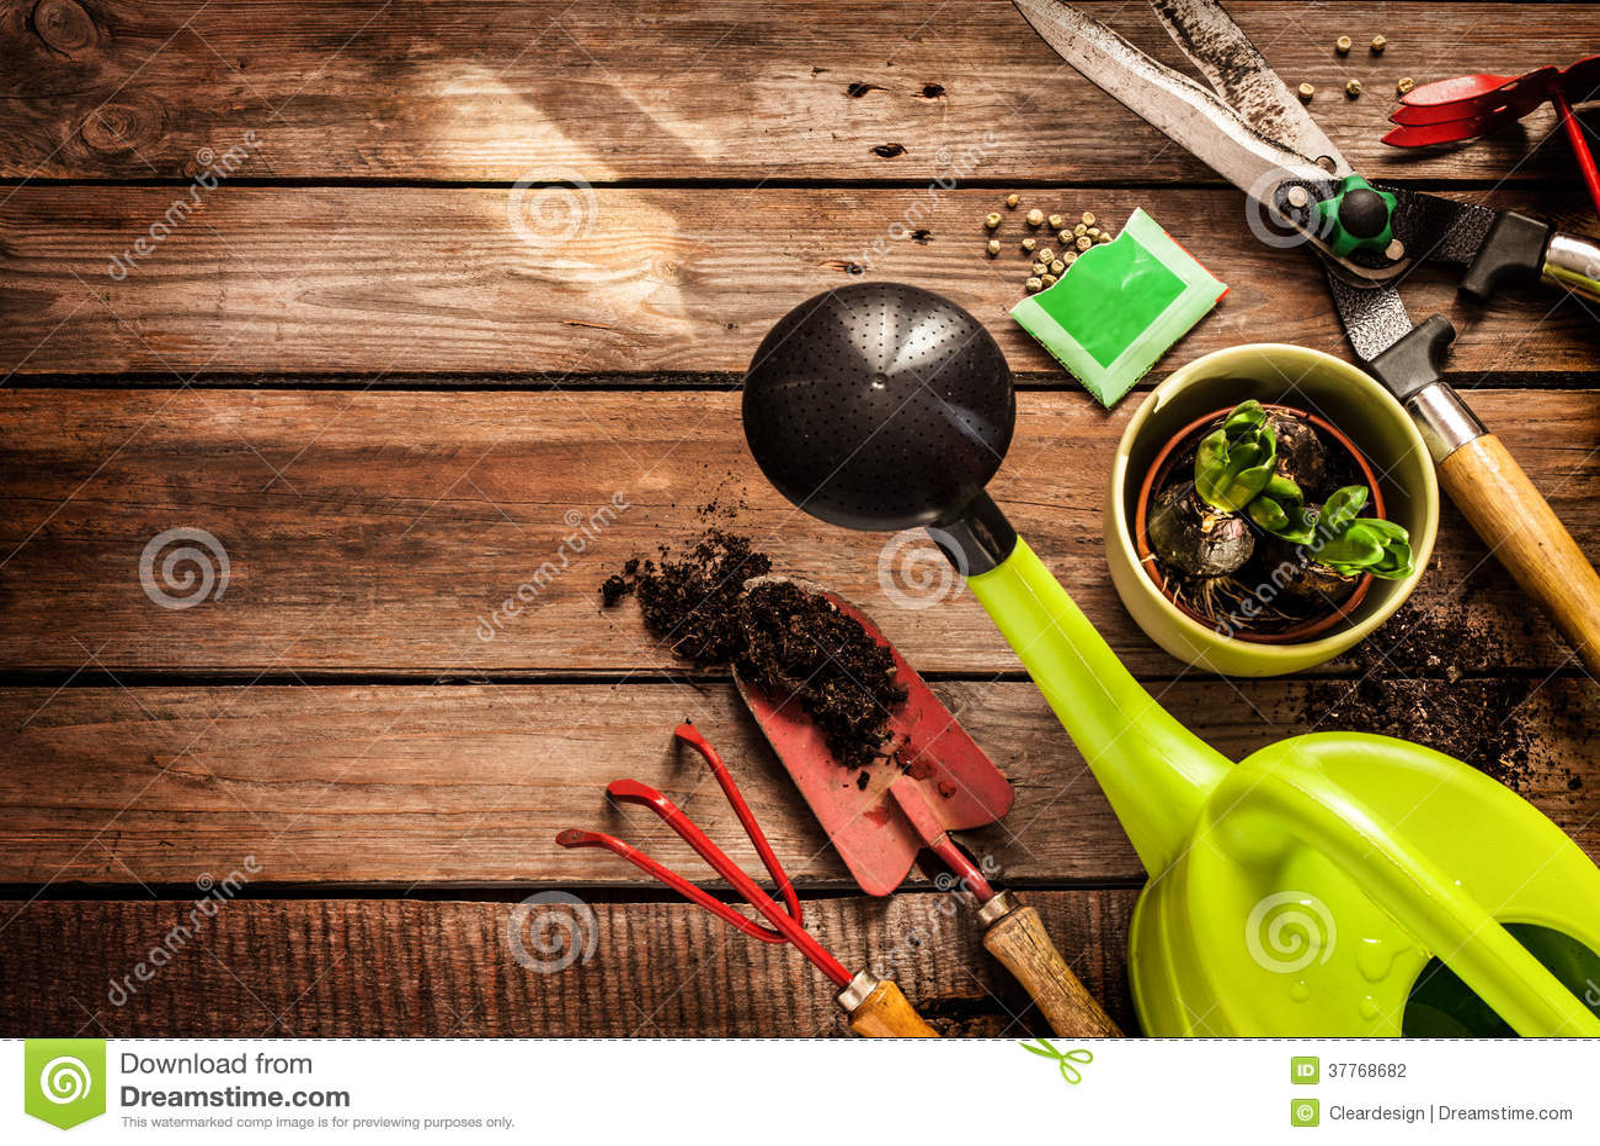 gardening tools on vintage wooden table spring stock photography image 37768682. Black Bedroom Furniture Sets. Home Design Ideas